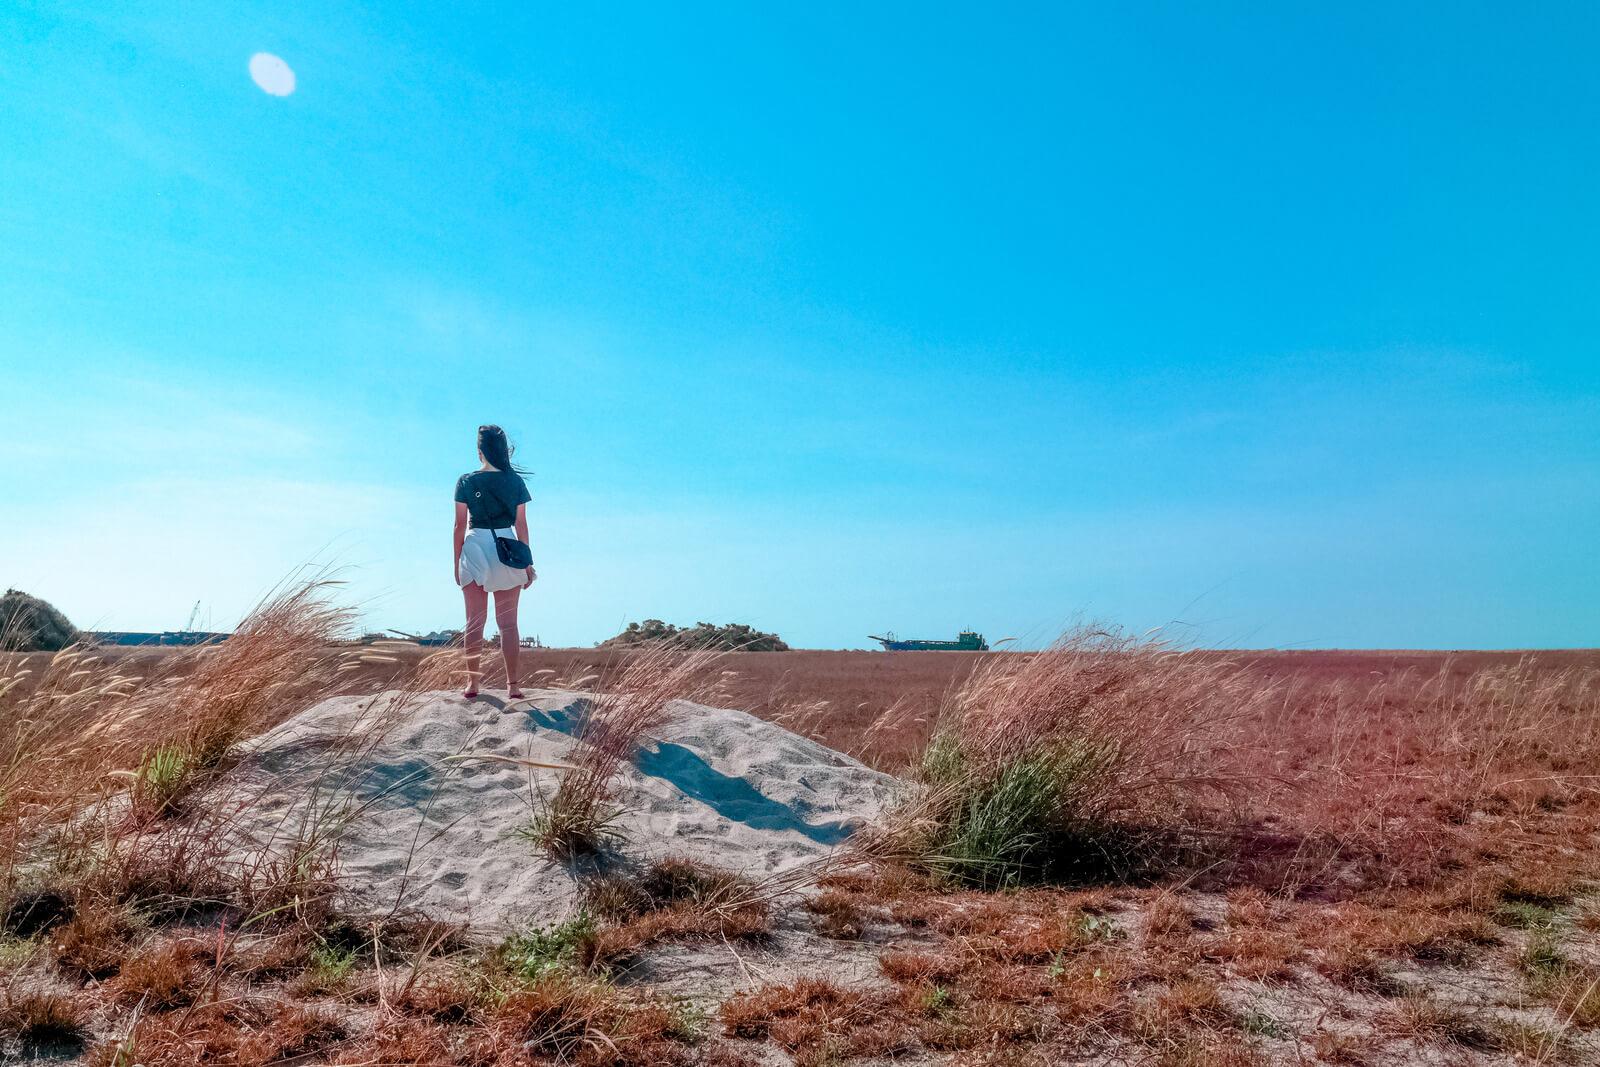 Woman Standing Beside Wheat Field - iPhone camera burst mode